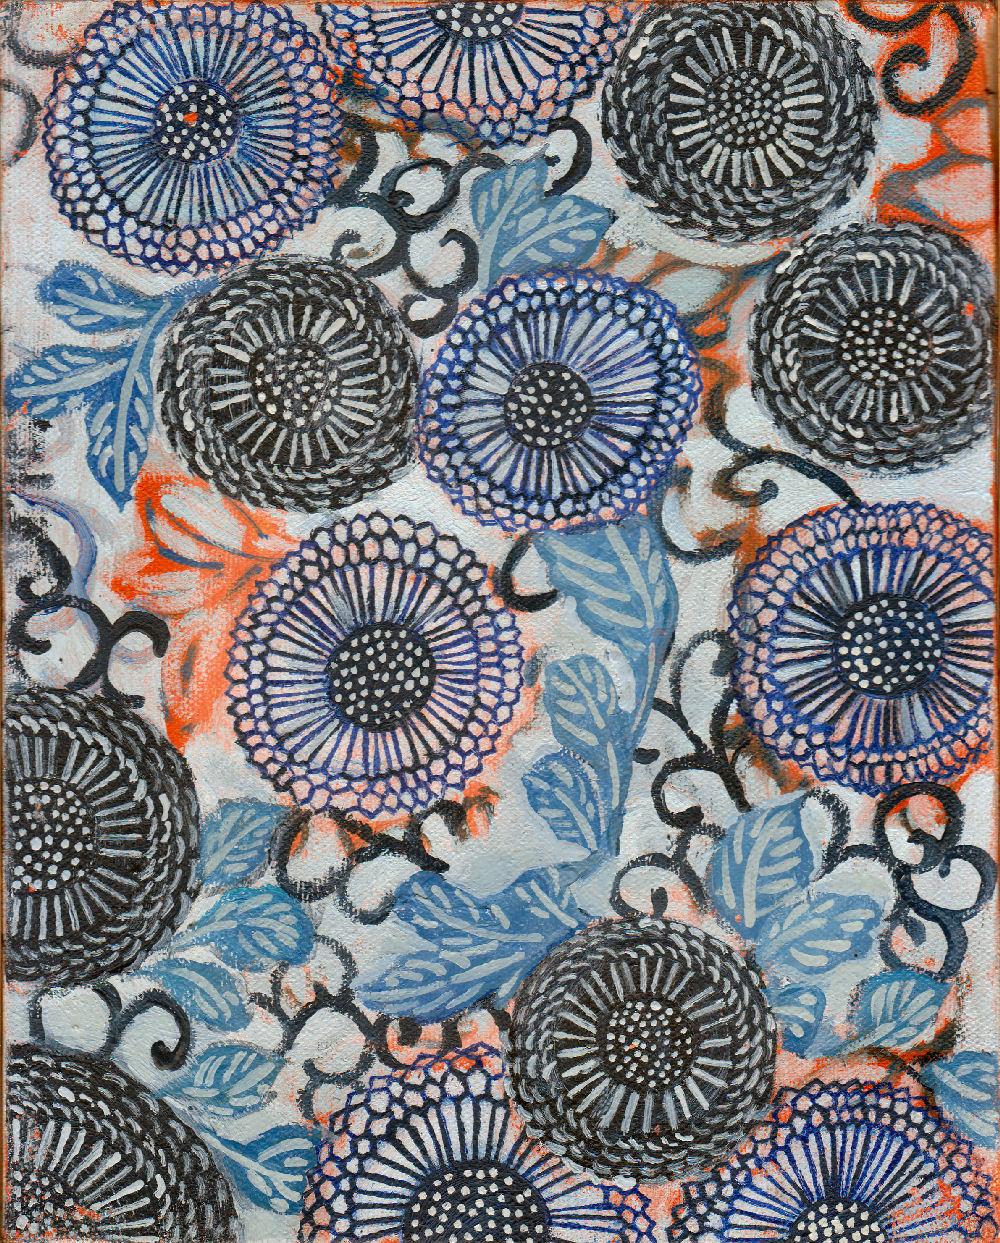 "Chrysanthemum Pattern, 8"" x 10"", oil on canvas, 1994"